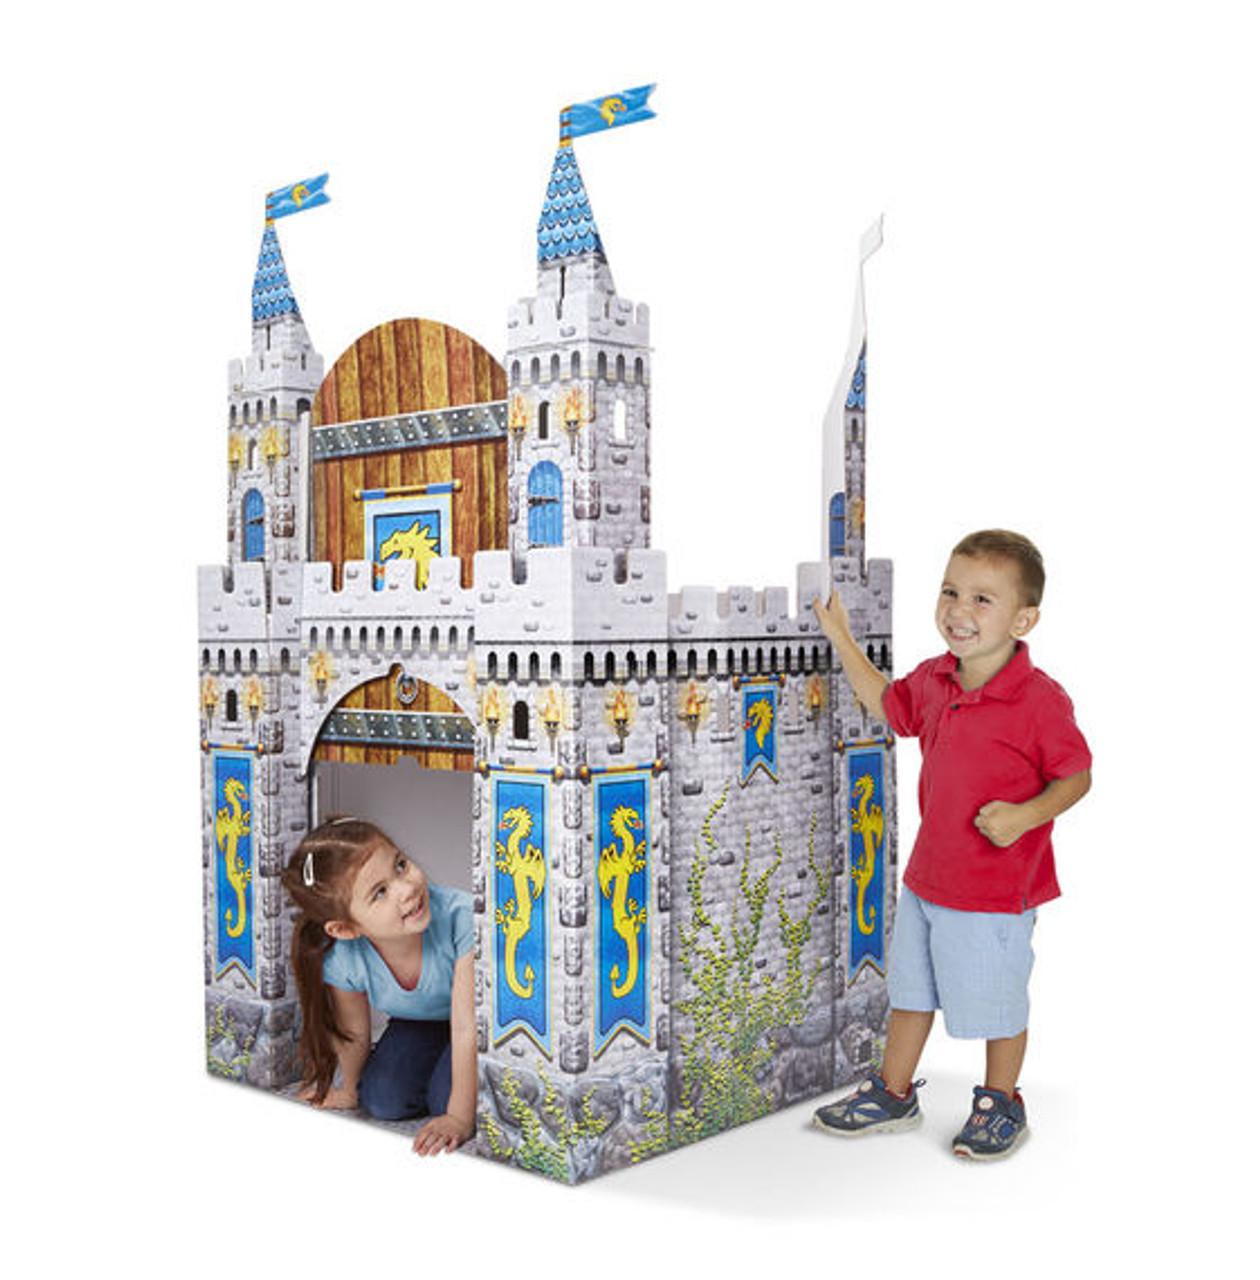 Melissa And Doug Cardboard Medieval Castle Indoor Playhouse